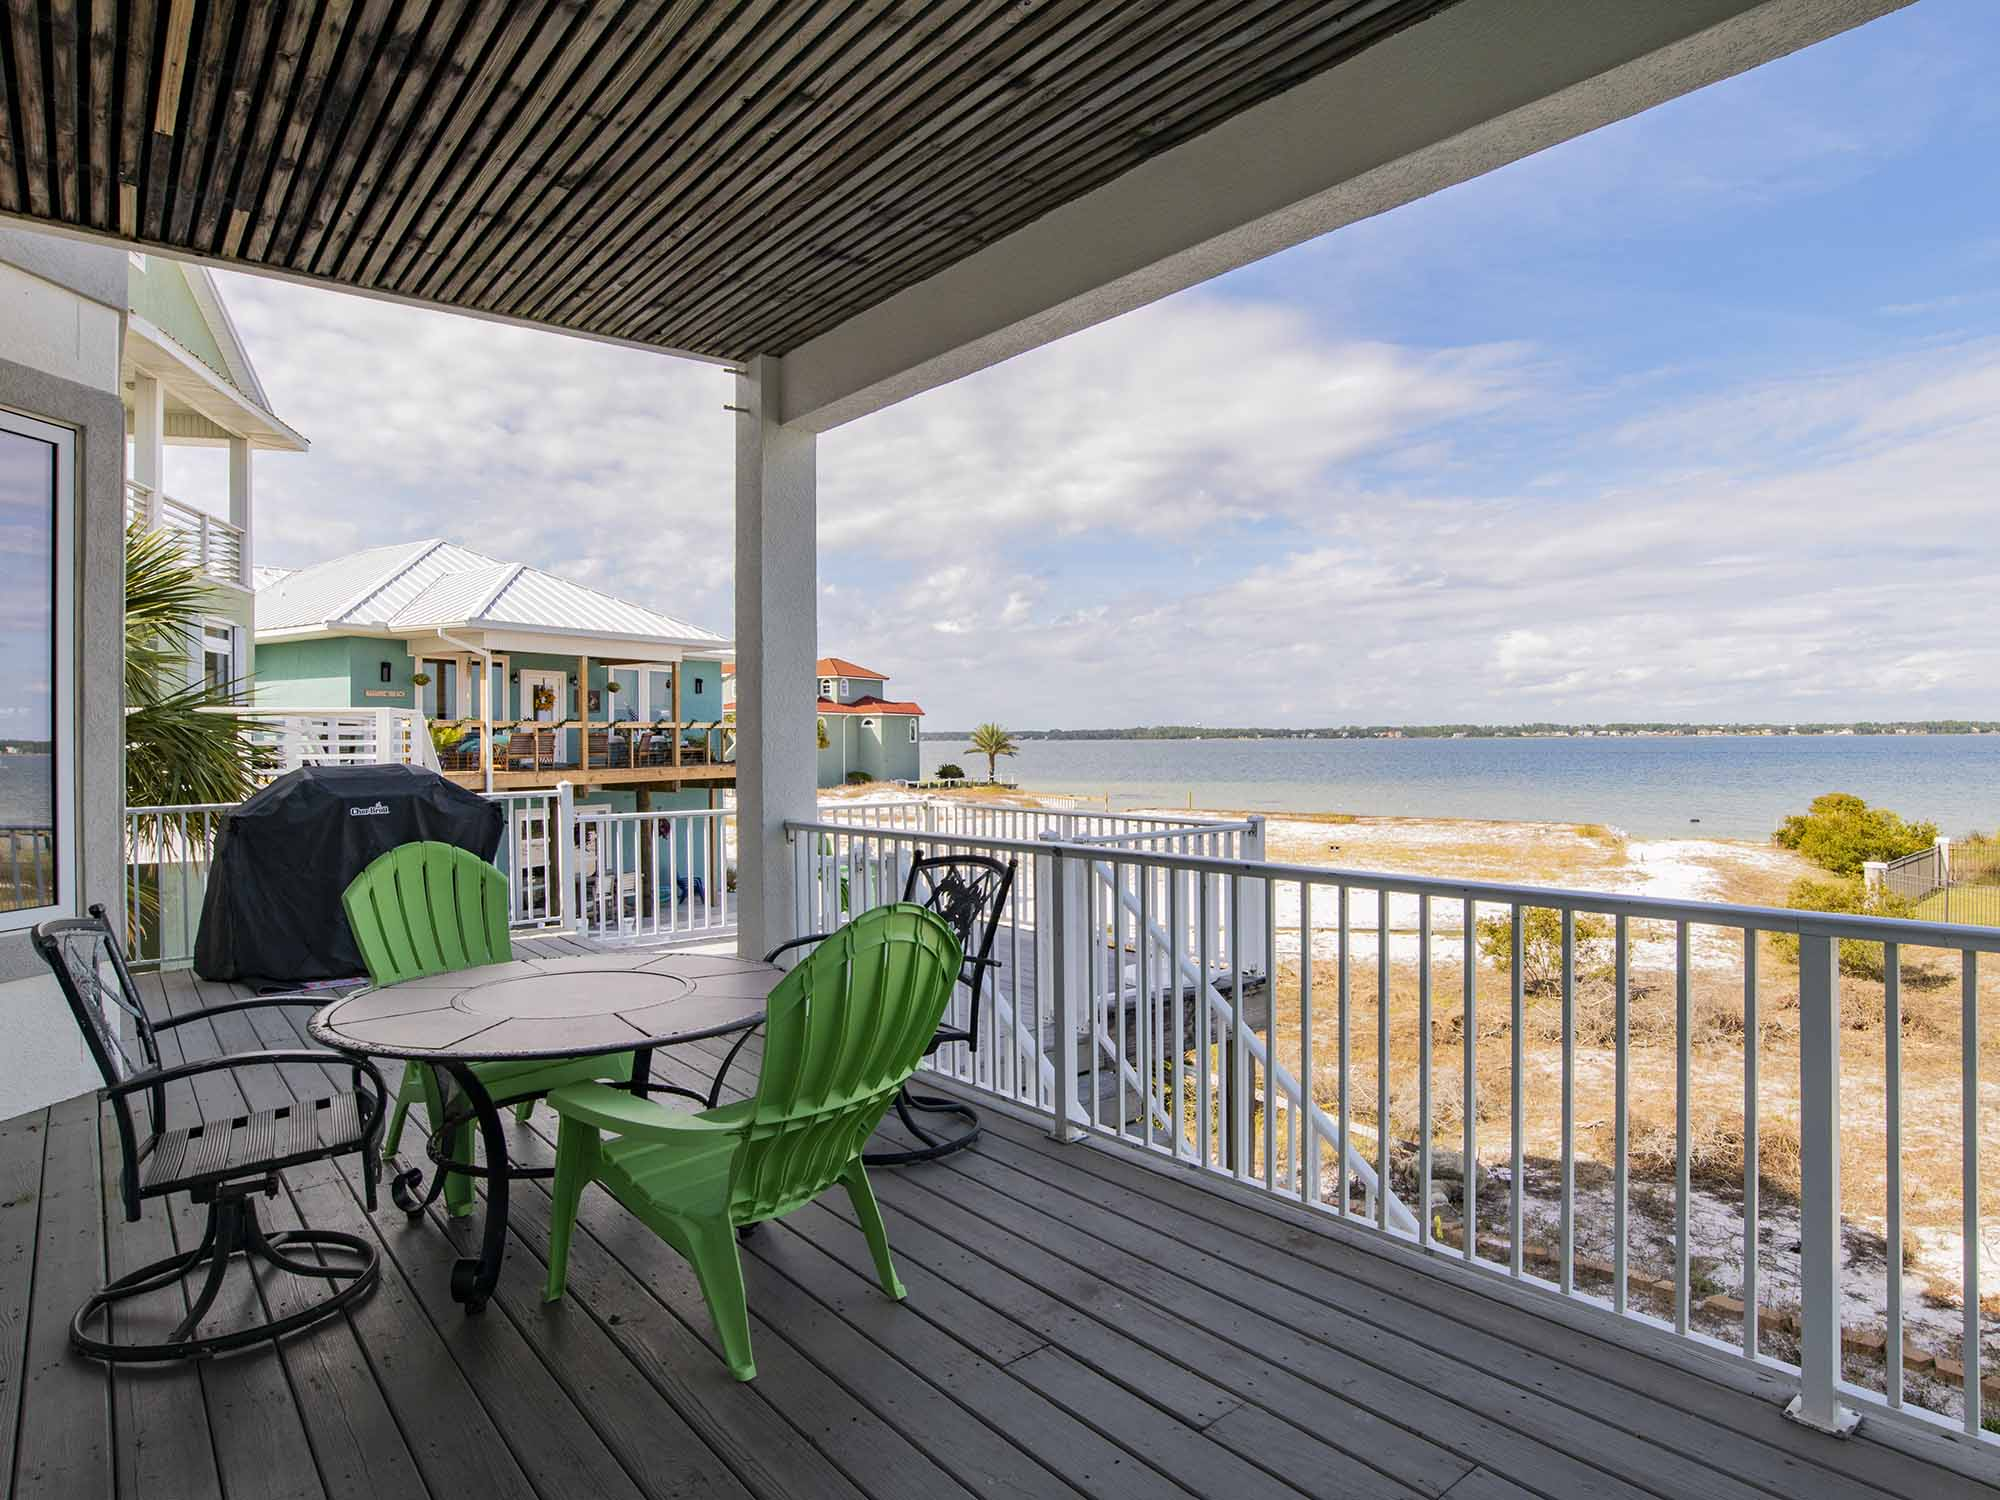 New Vacation Rentals in Navarre Beach